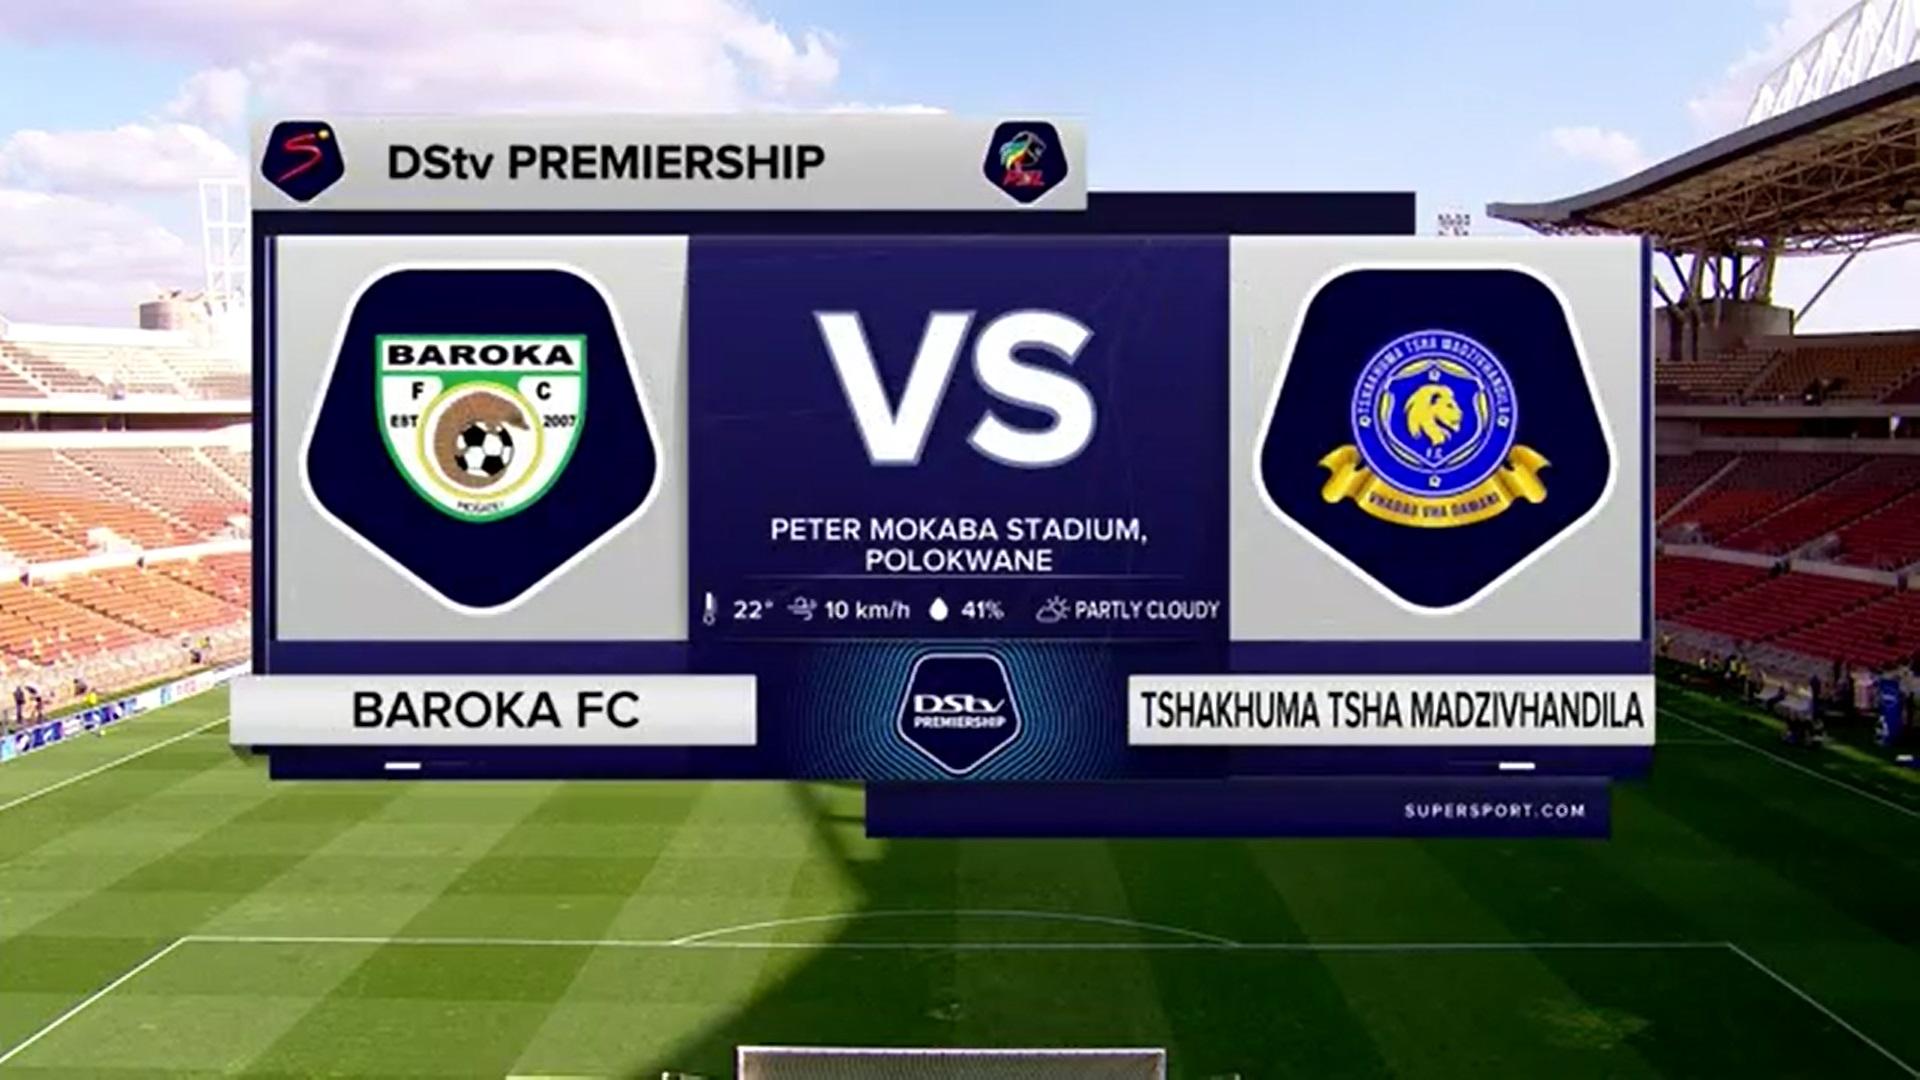 DStv Premiership | Baroka FC v Tshakhuma Tsha Madzivhandila | Highlights